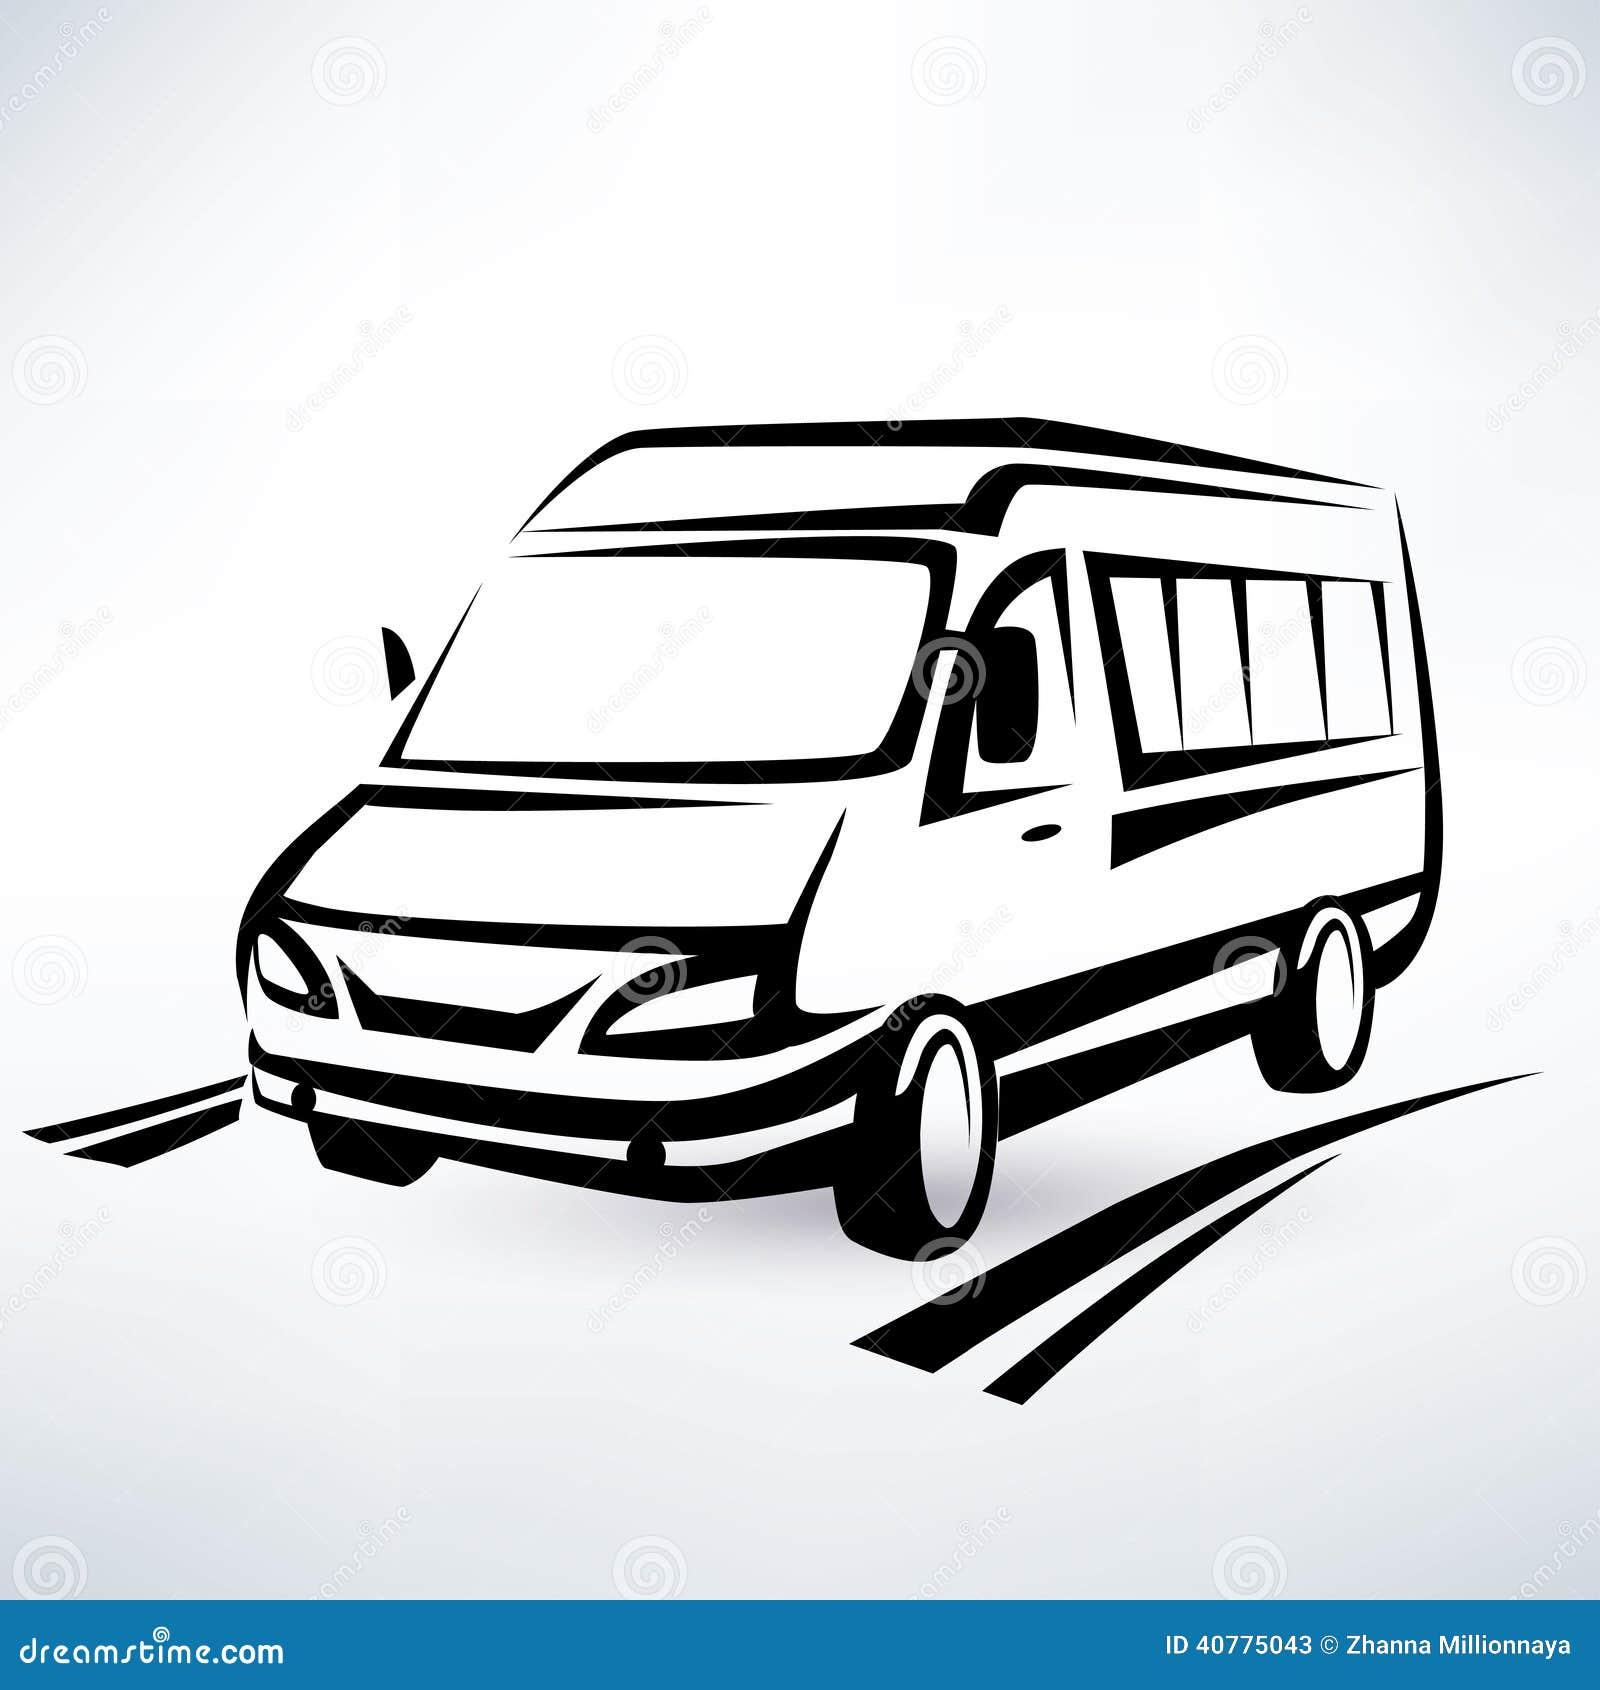 Mini Van Outlined Sketch Stock Vector Image 40775043